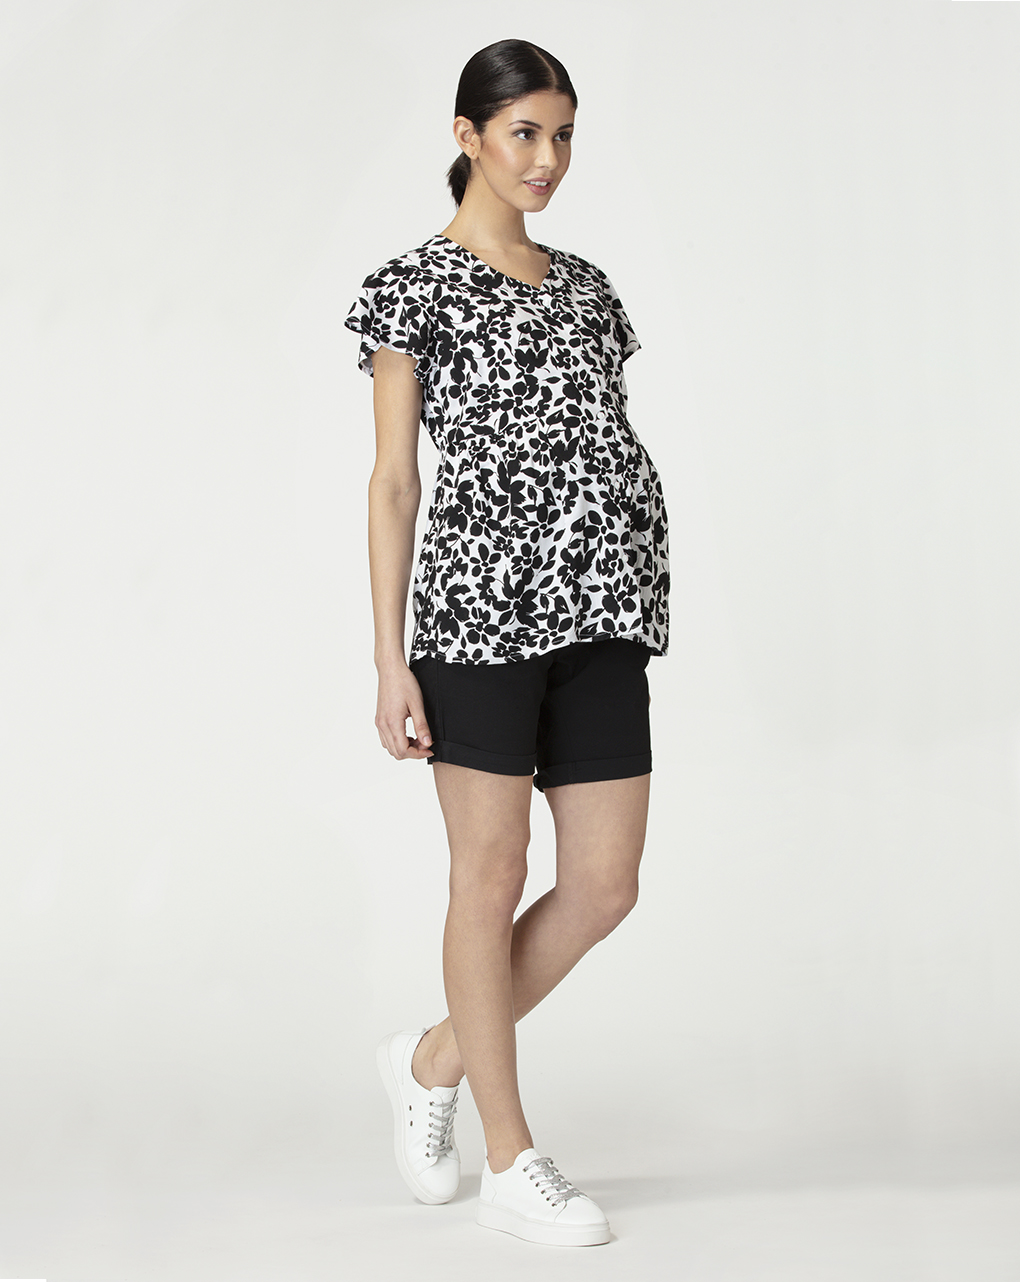 Camicia premaman con stampa floreale - Prénatal